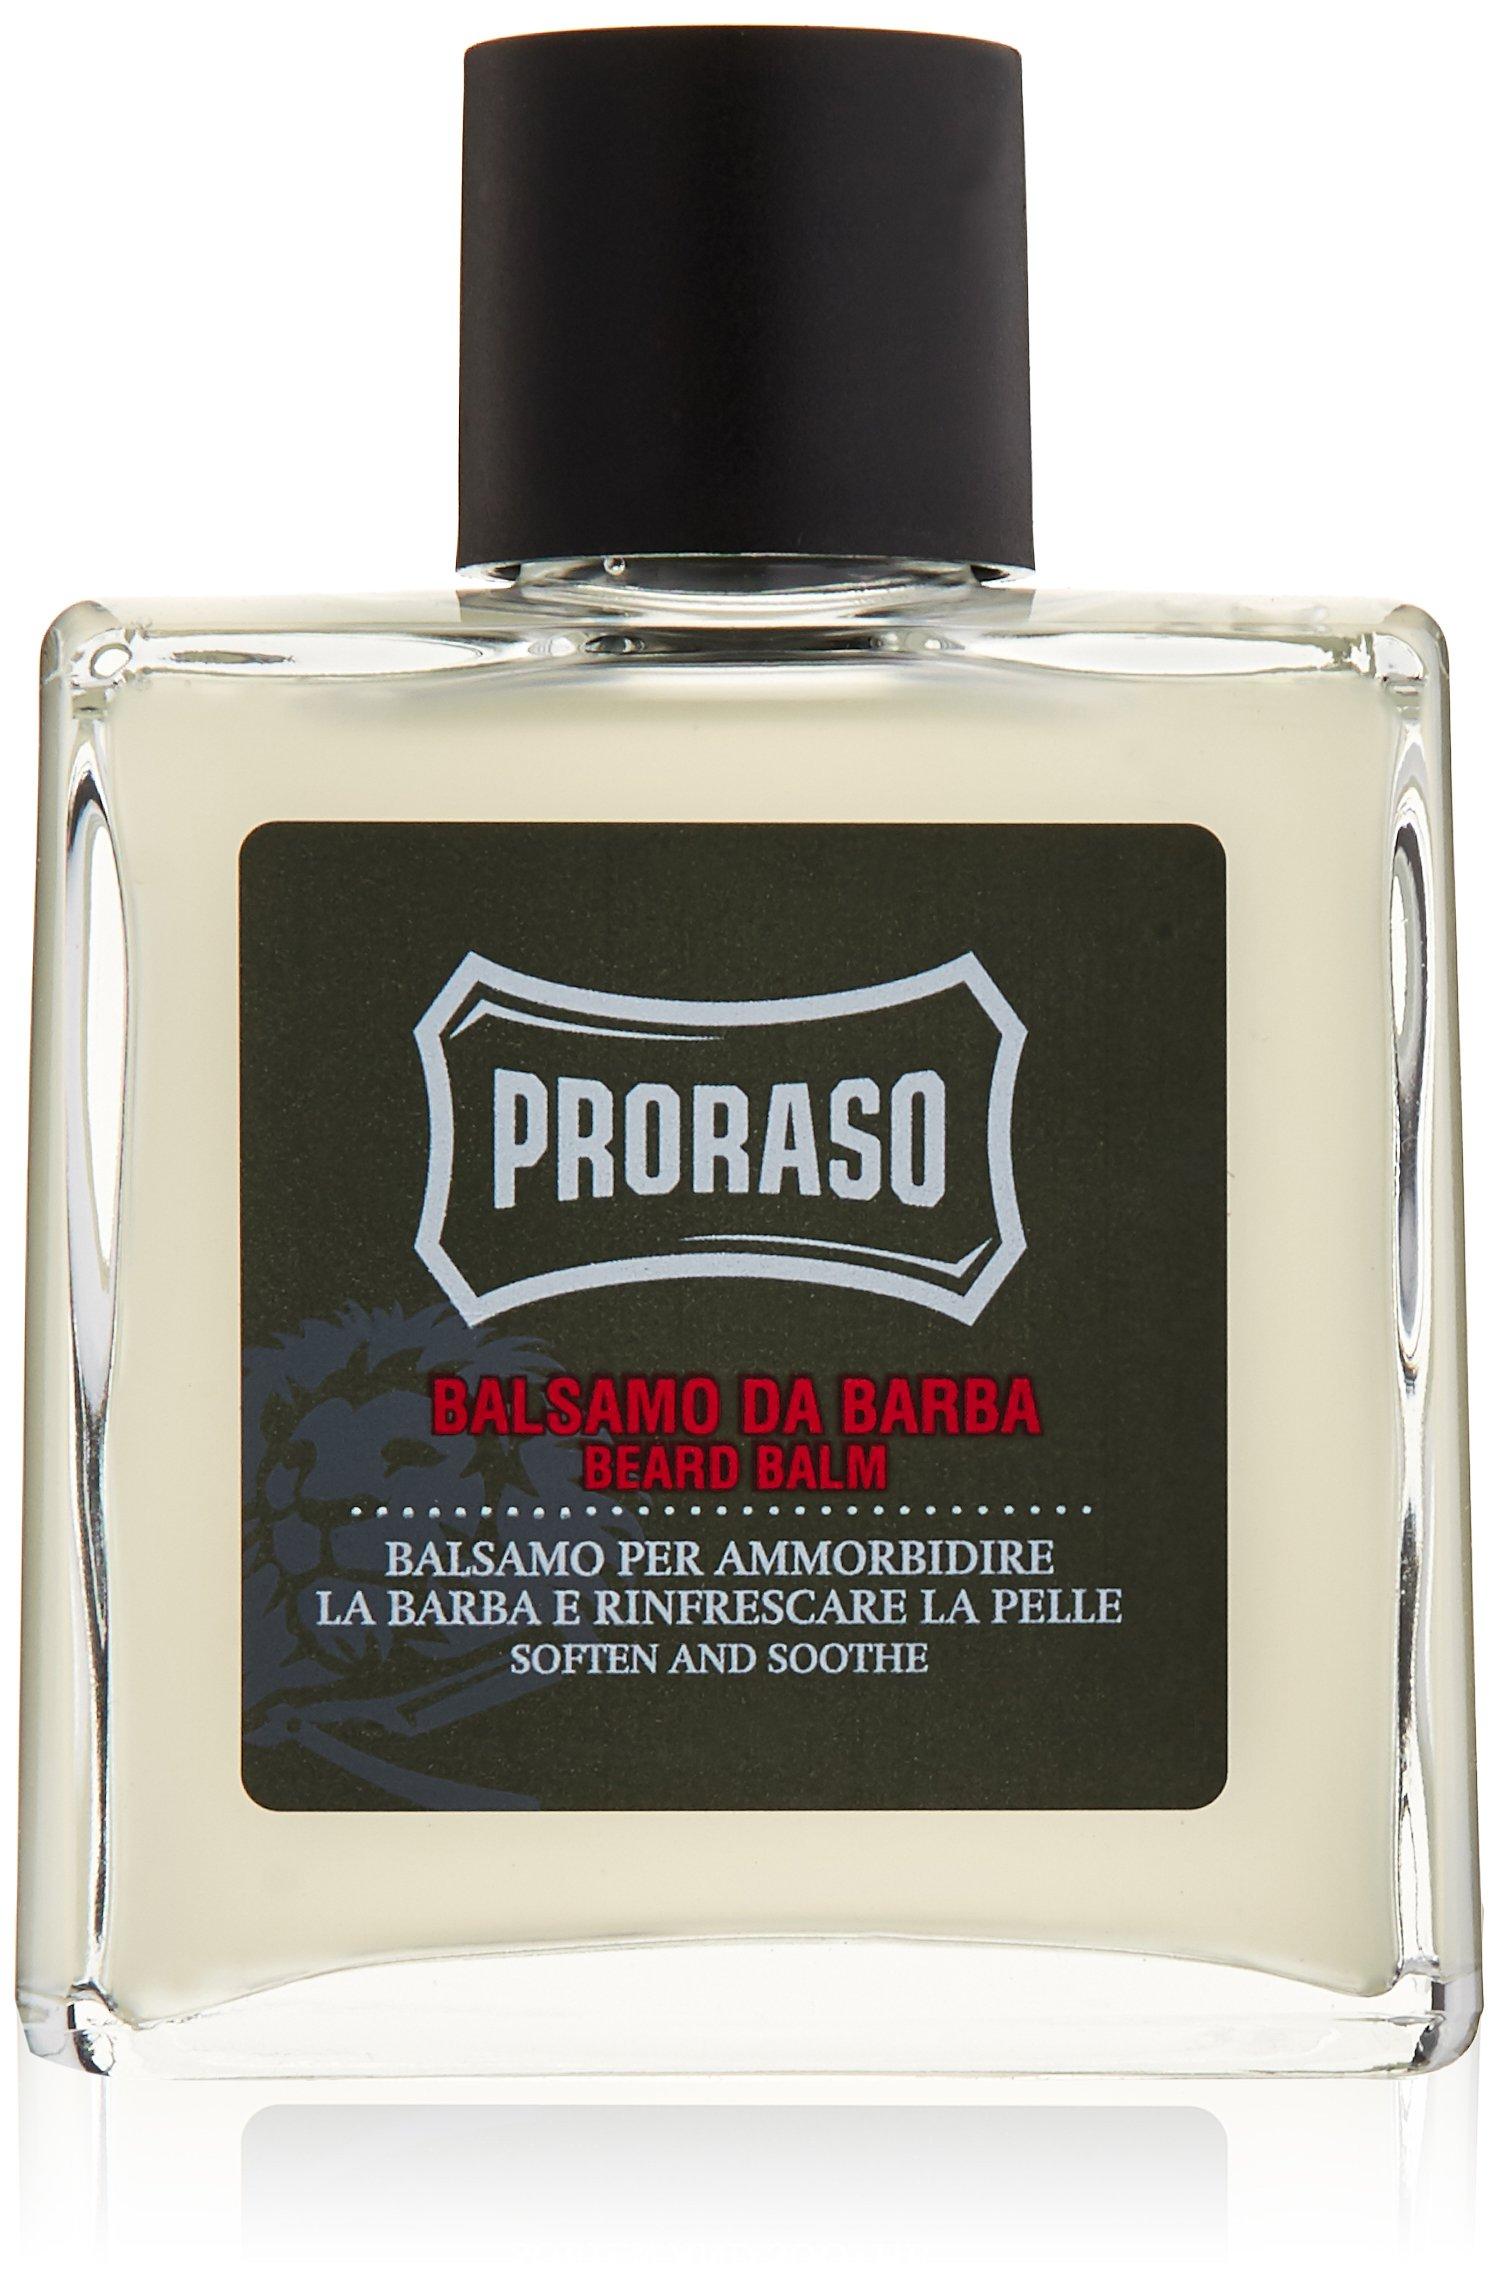 Proraso Beard Balm, 3.4 Fl. oz.